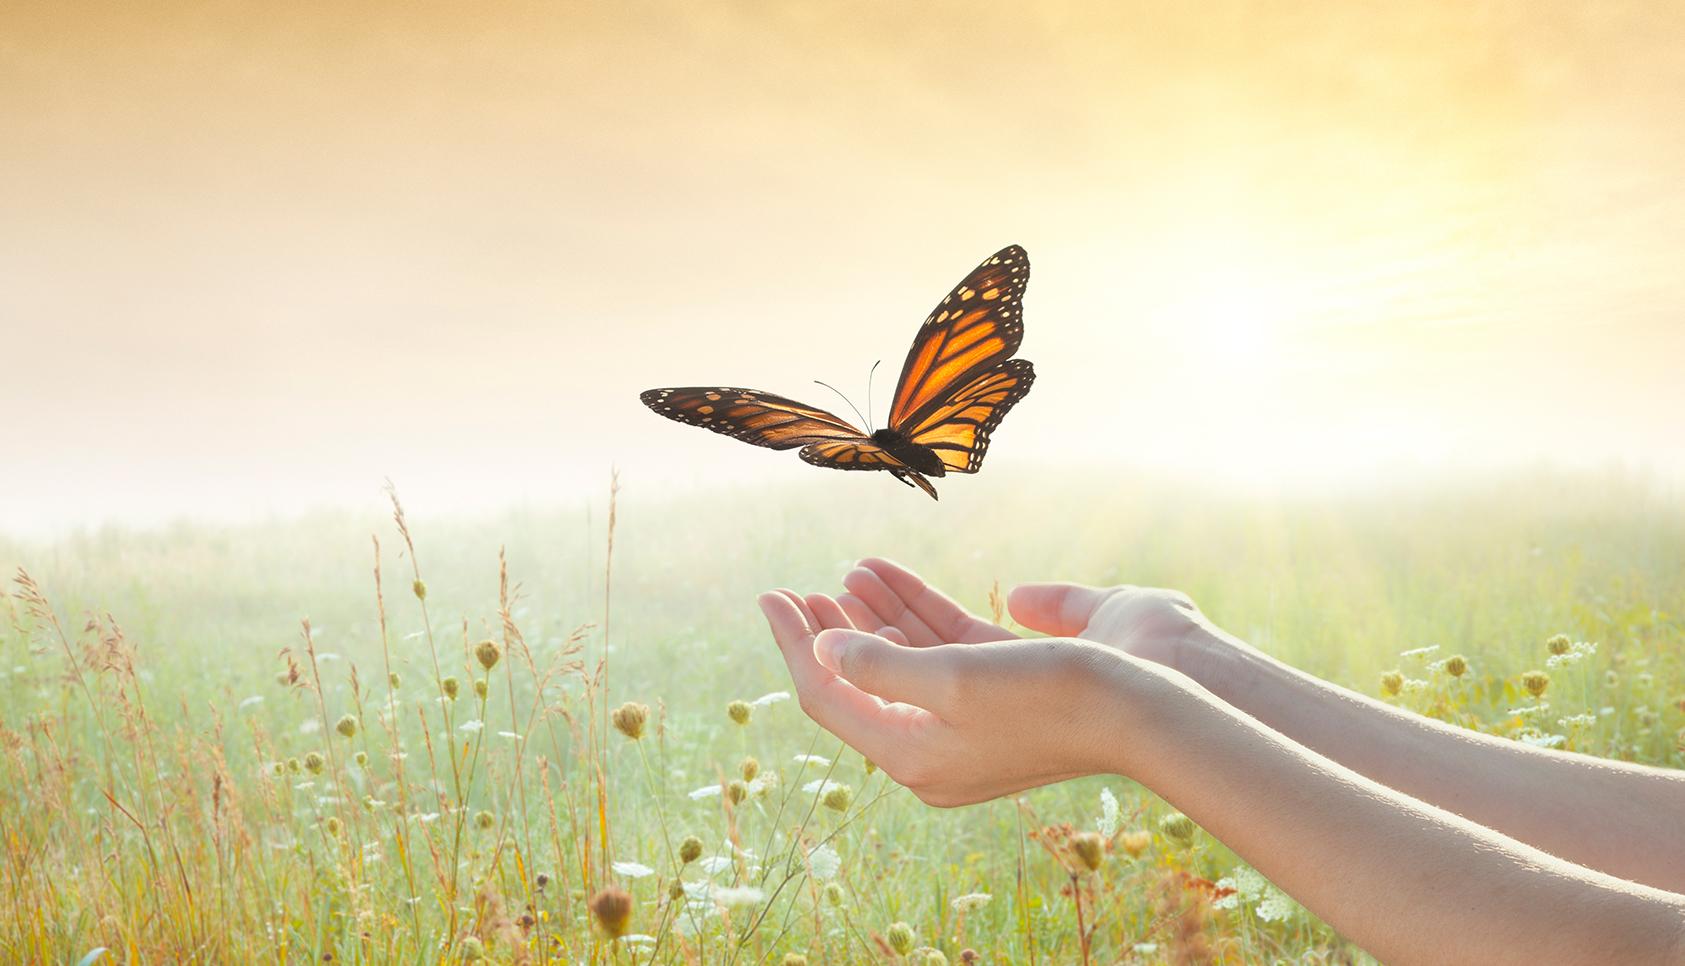 Girl releasing a butterfly over a sunset field